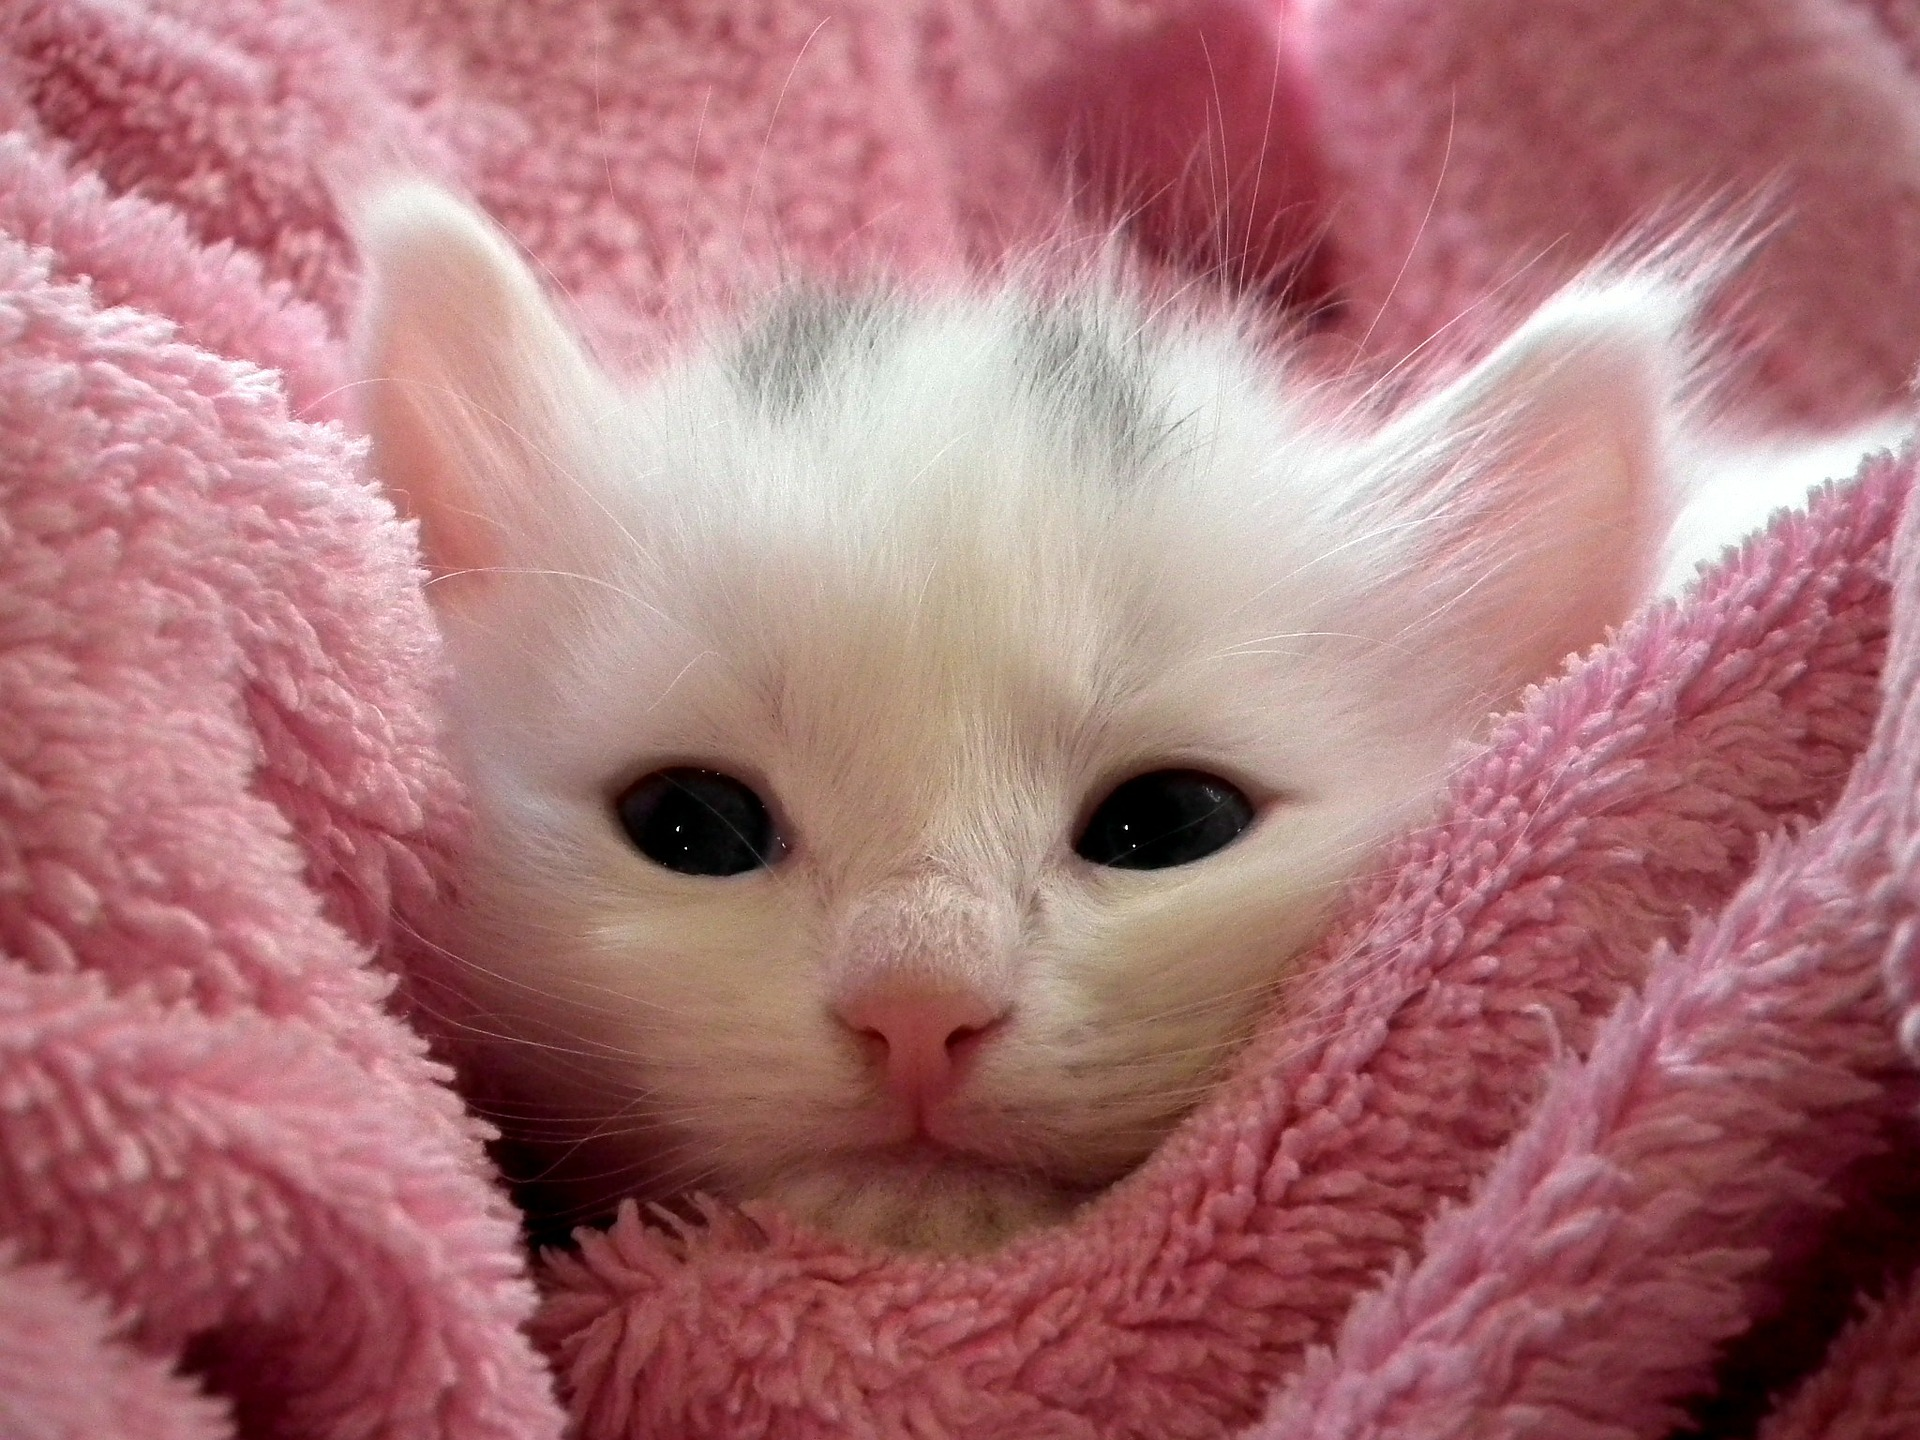 Download 101+  Gambar Kucing Yg Imut Dan Lucu Paling Bagus HD